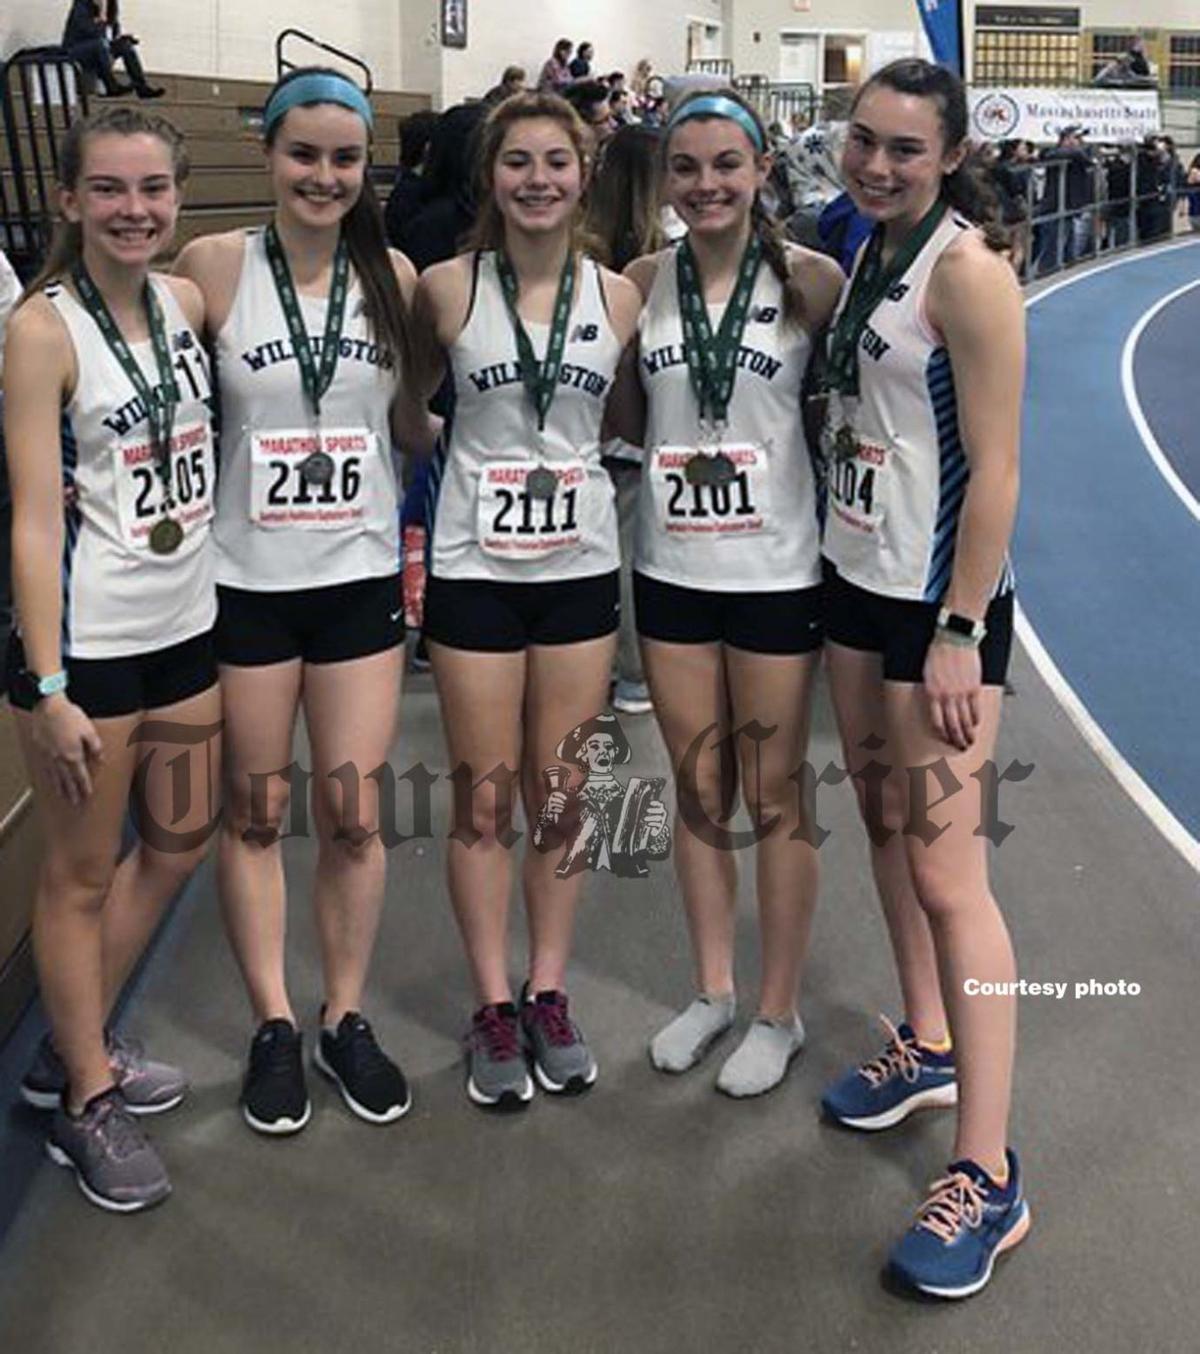 Wildcat medalists at the Freshmen/Sophomore Meet